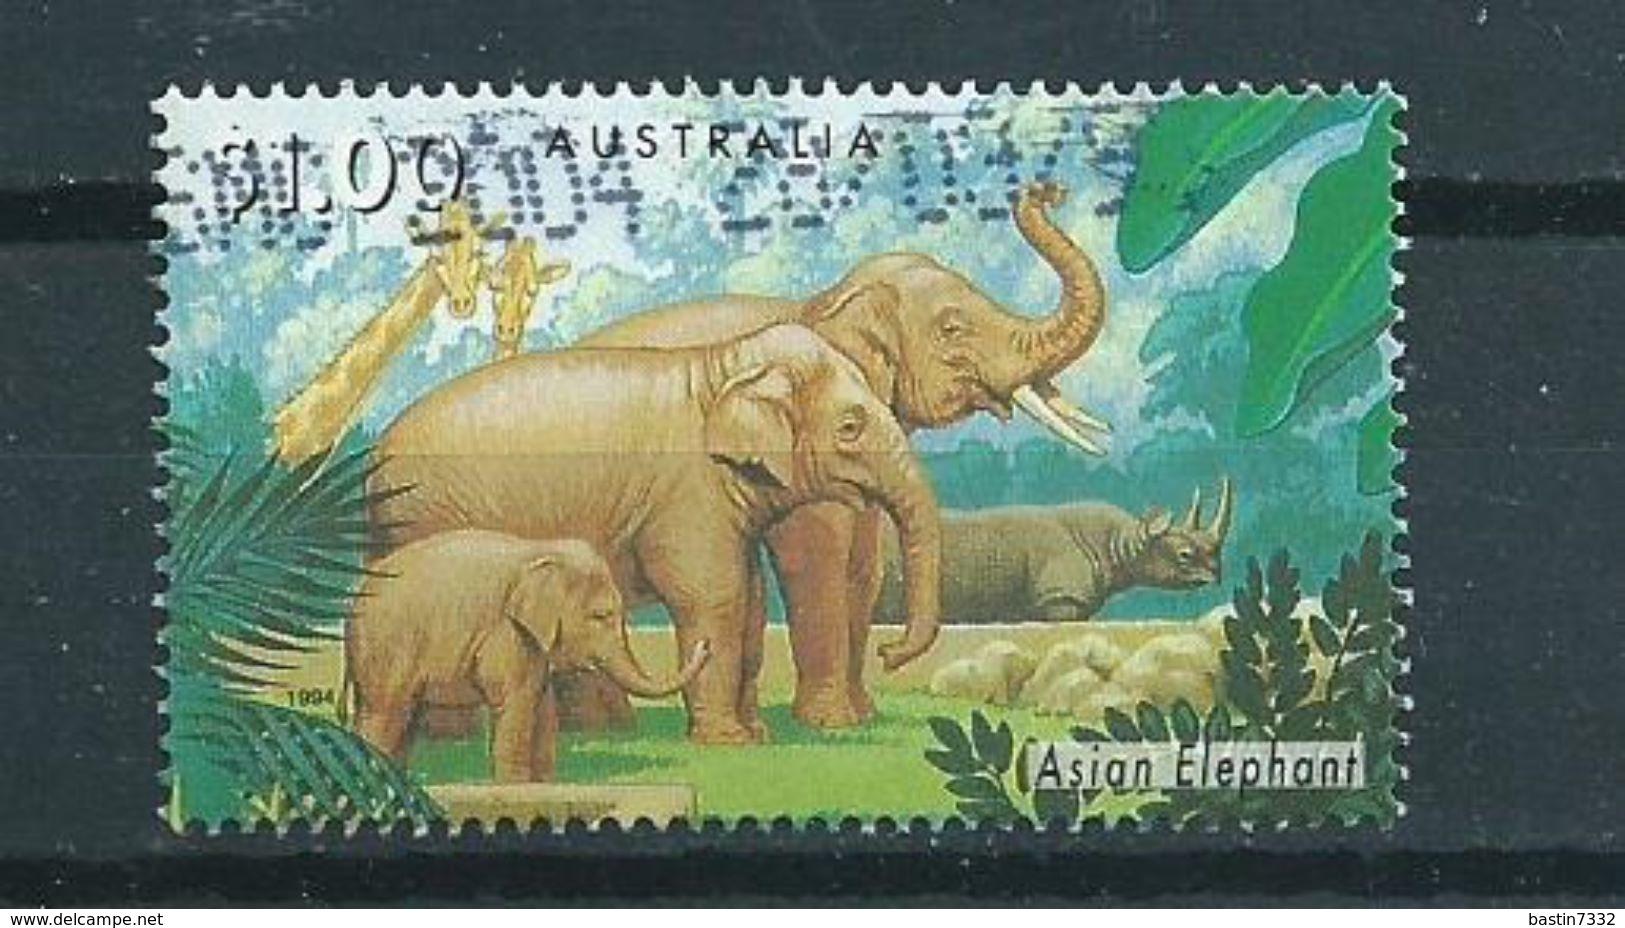 1994 Australia $1.00 Zoo,elephant,olifant,dieren,animals Used/gebruikt/oblitere - 1990-99 Elizabeth II